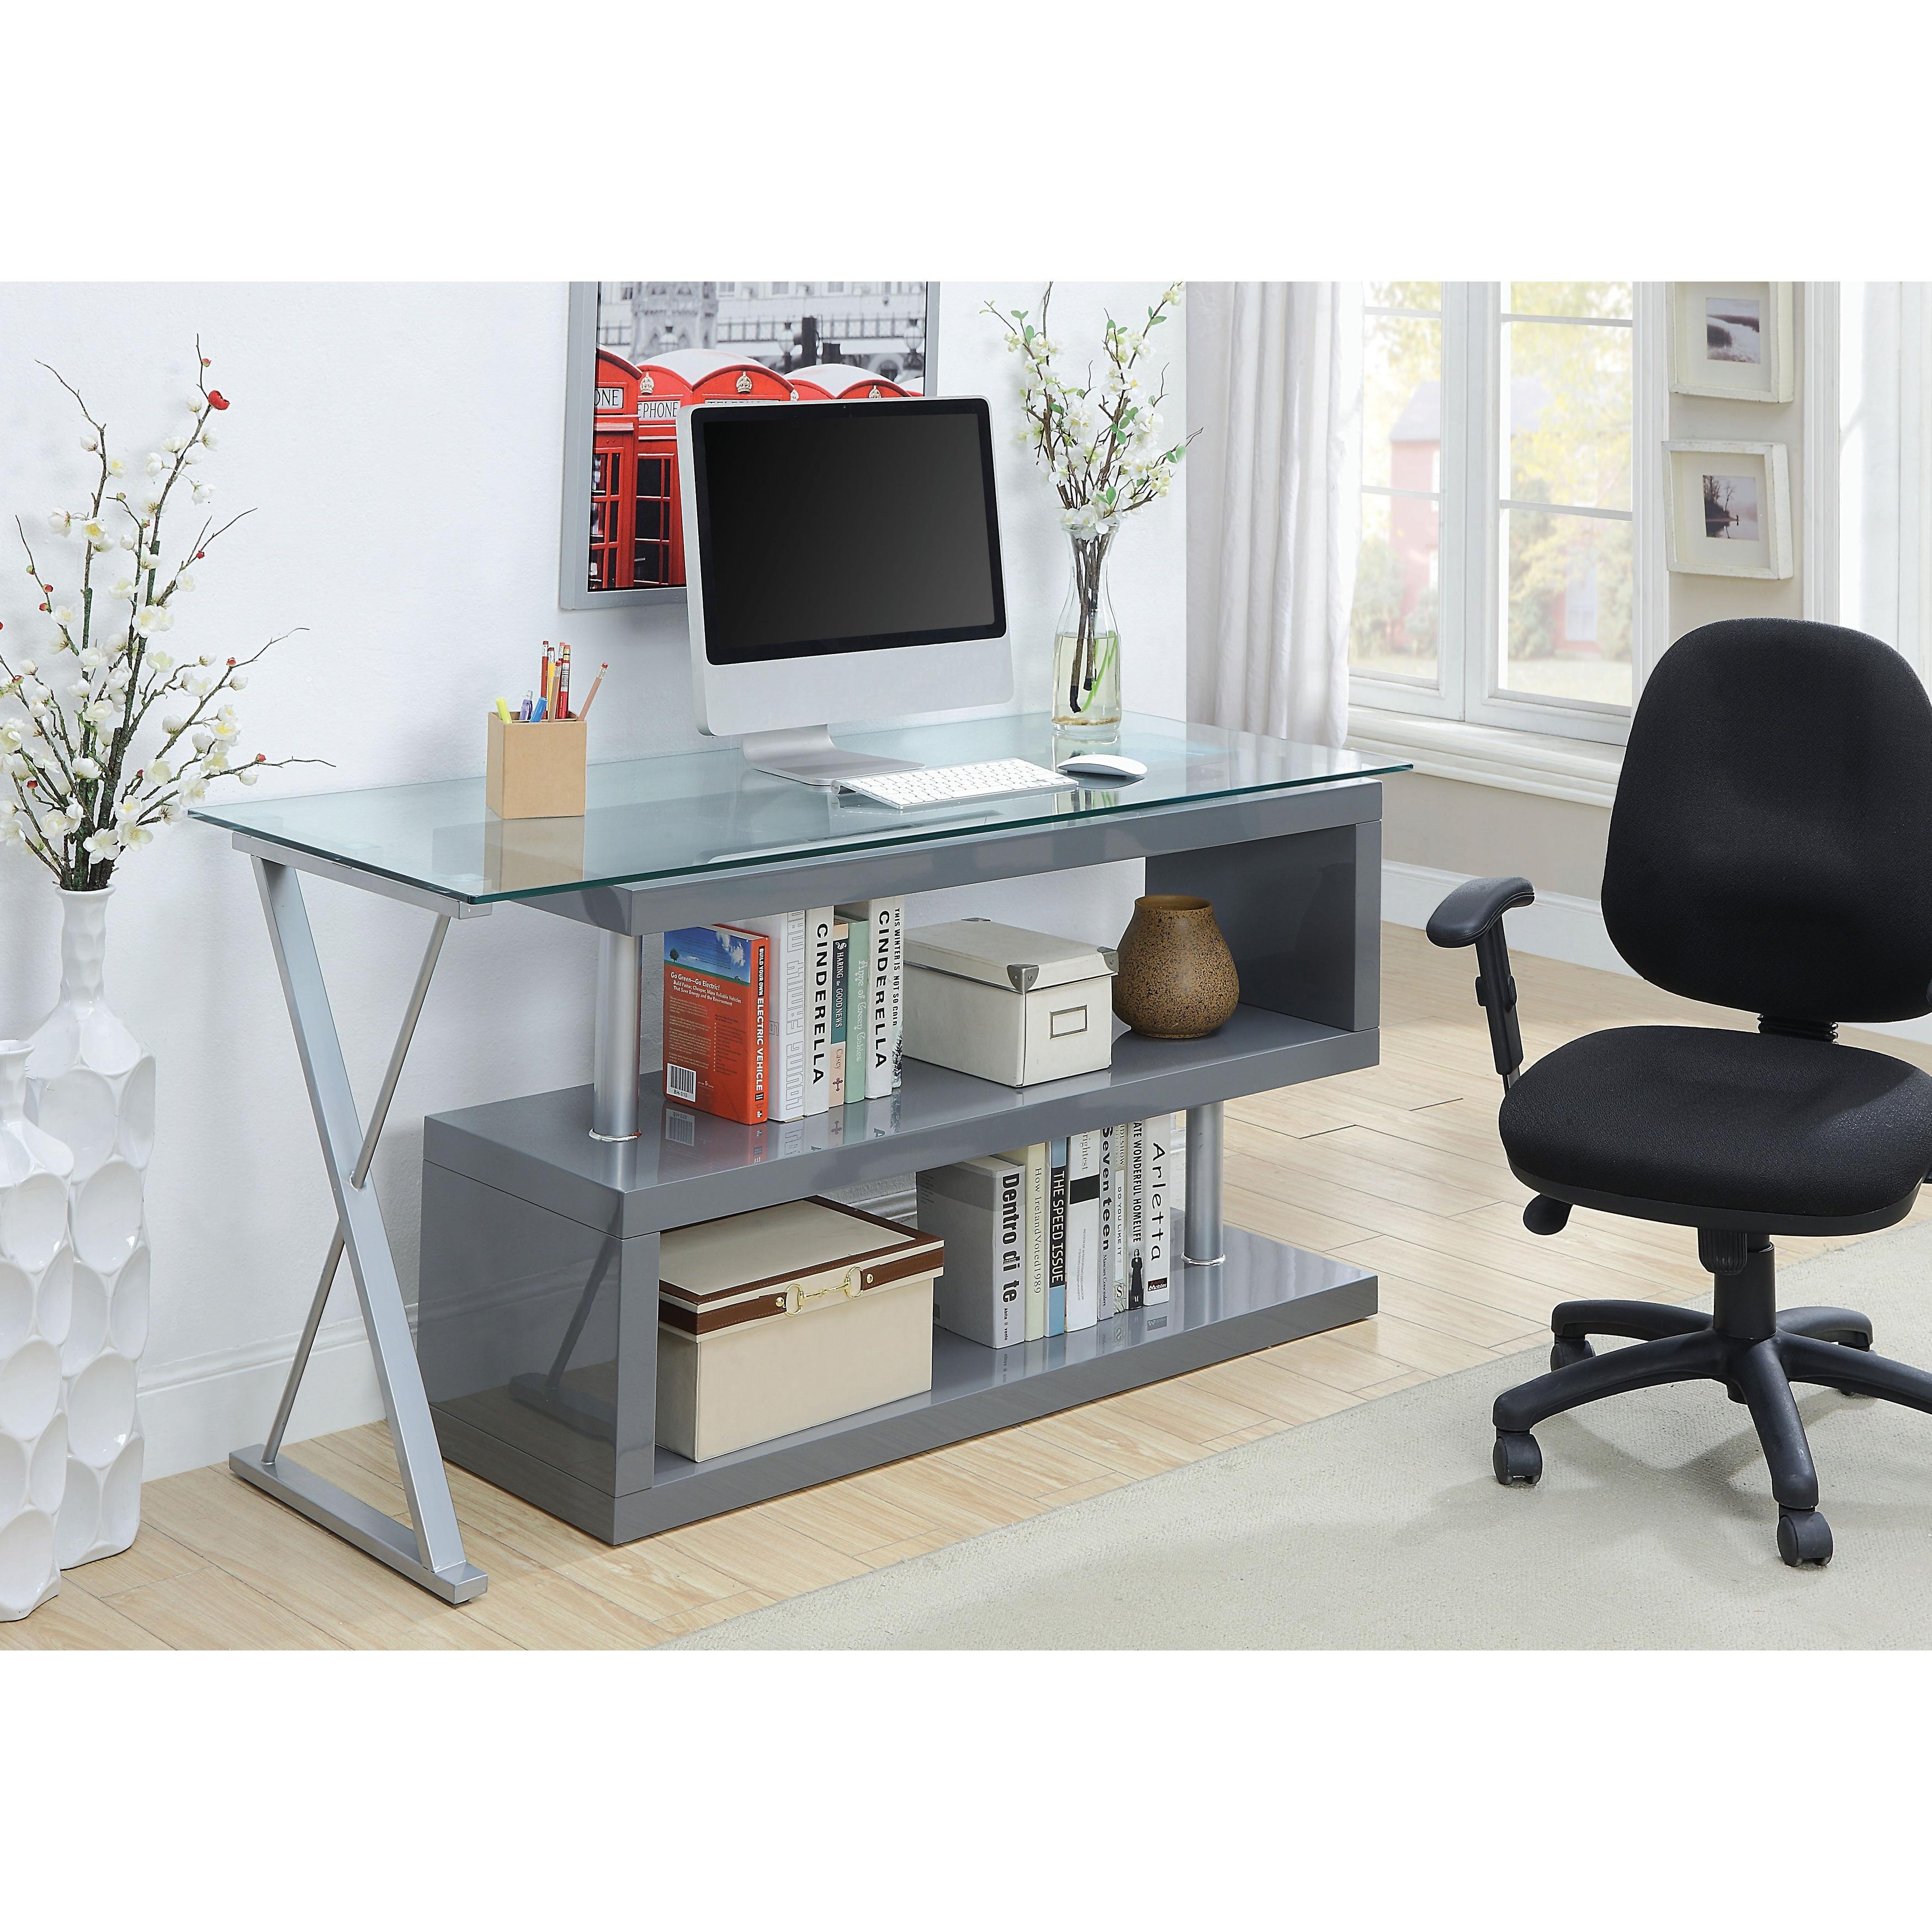 Furniture of America Marisa Contemporary Convertible Executive Desk - Free  Shipping Today - Overstock.com - 18170258